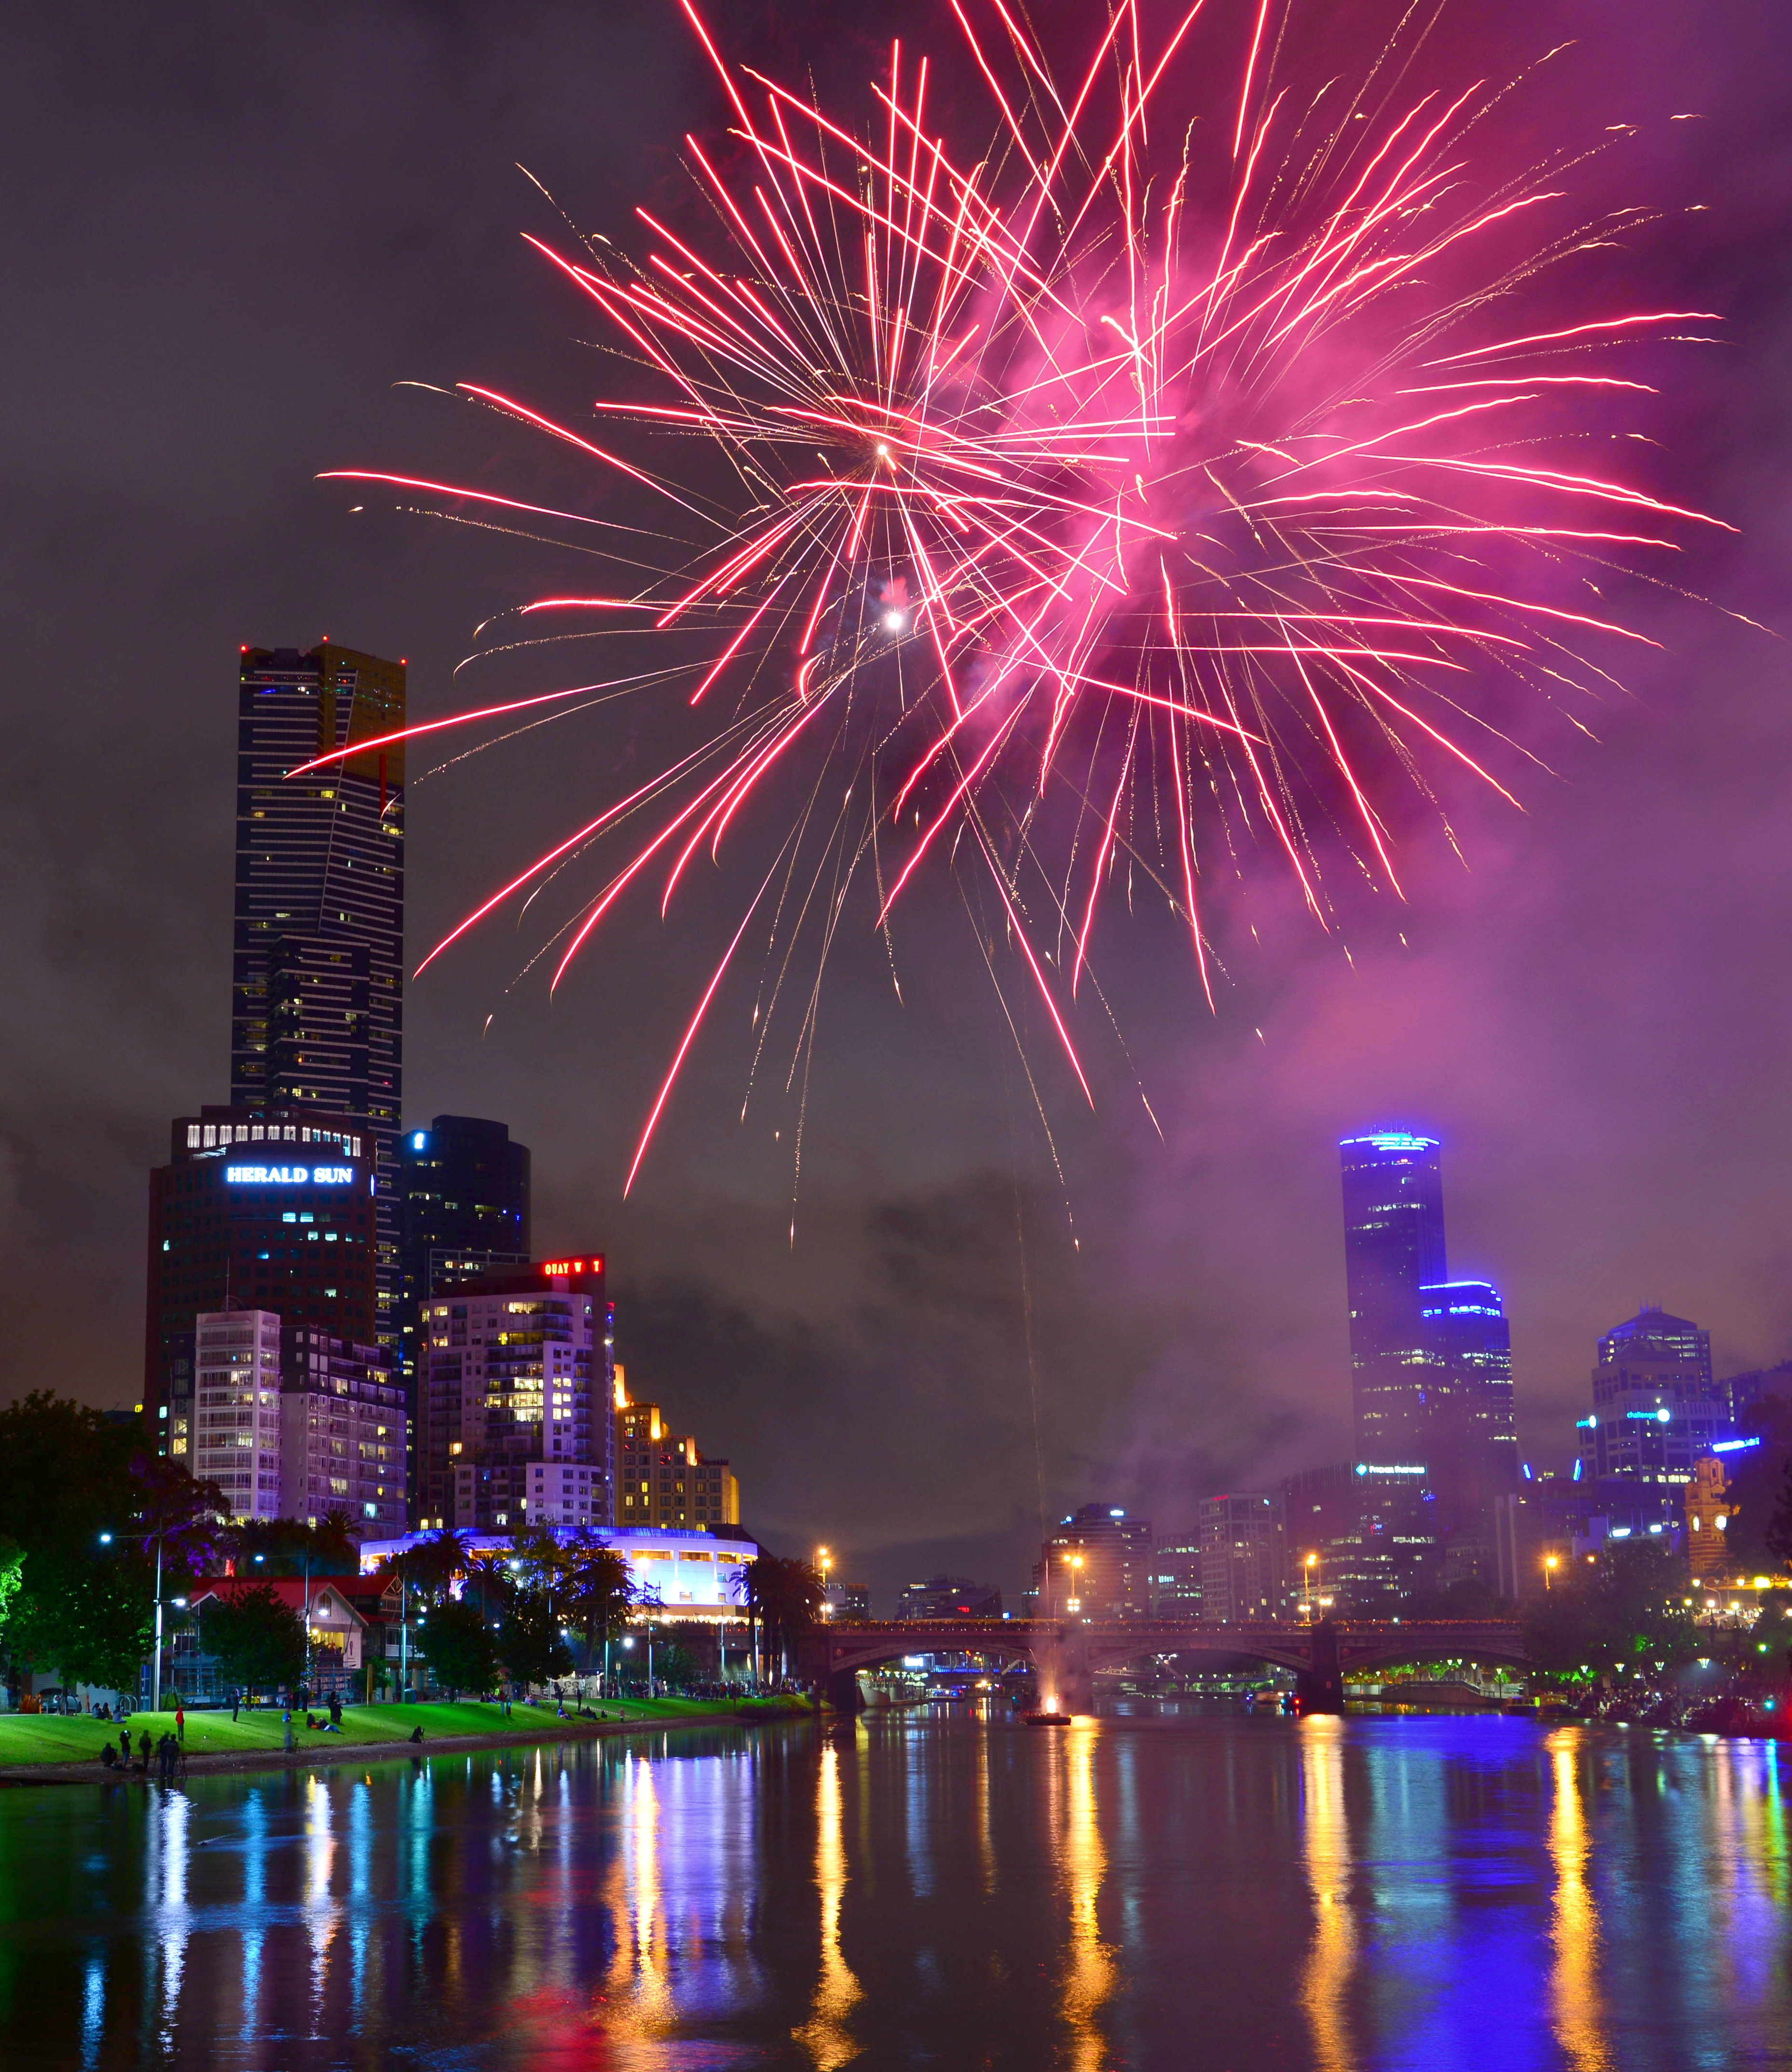 Diwali dates 2019 in Melbourne